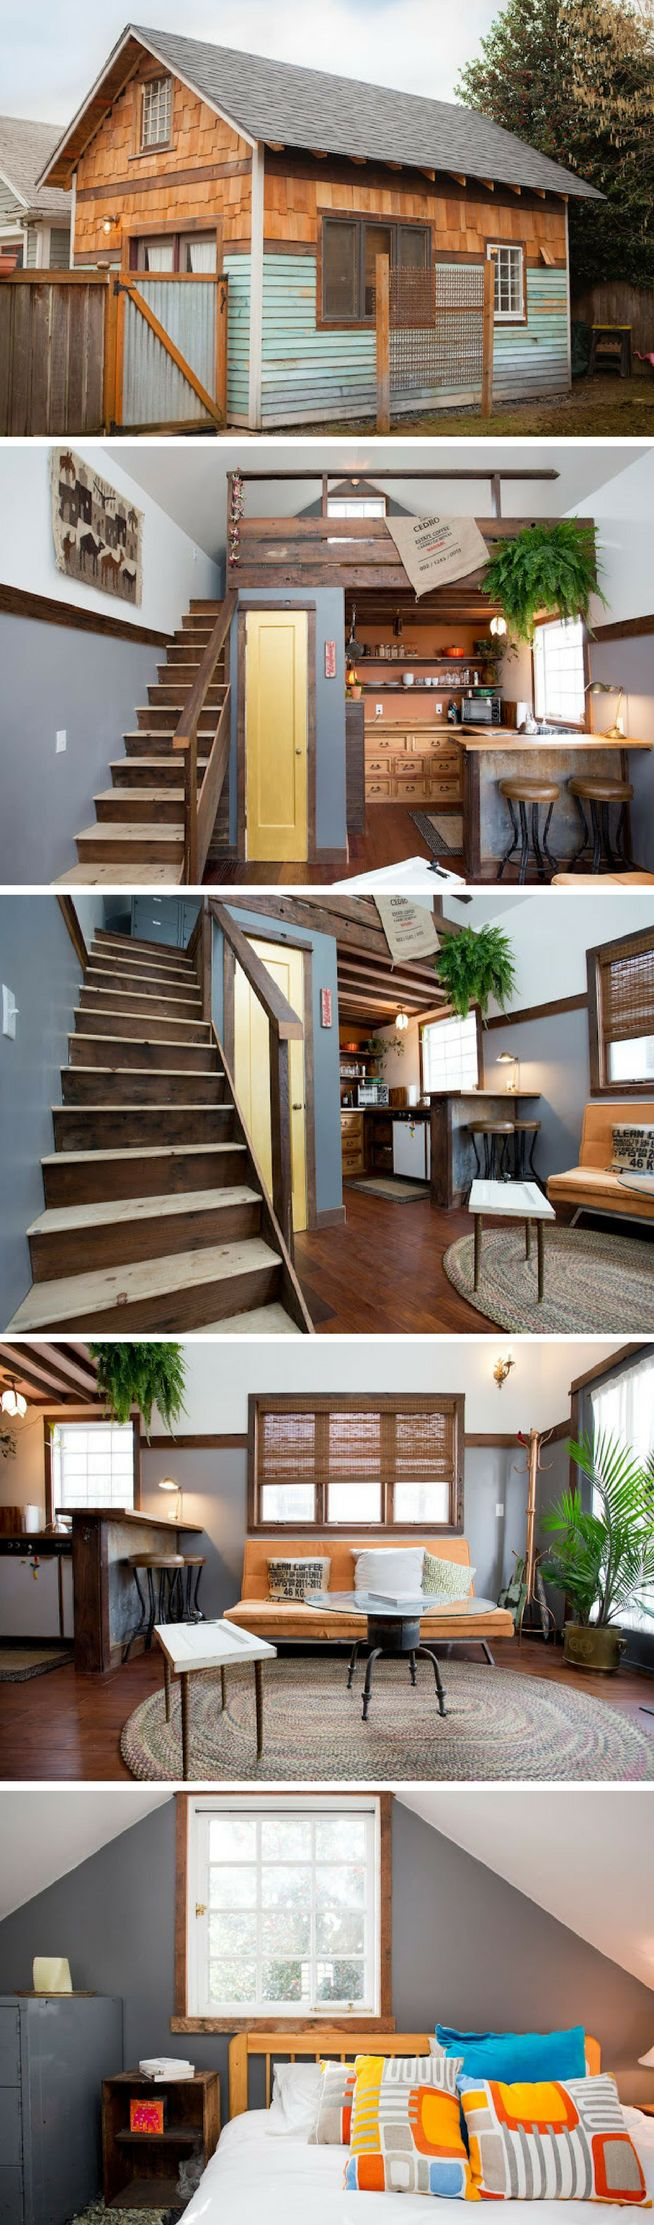 Portland tiny house